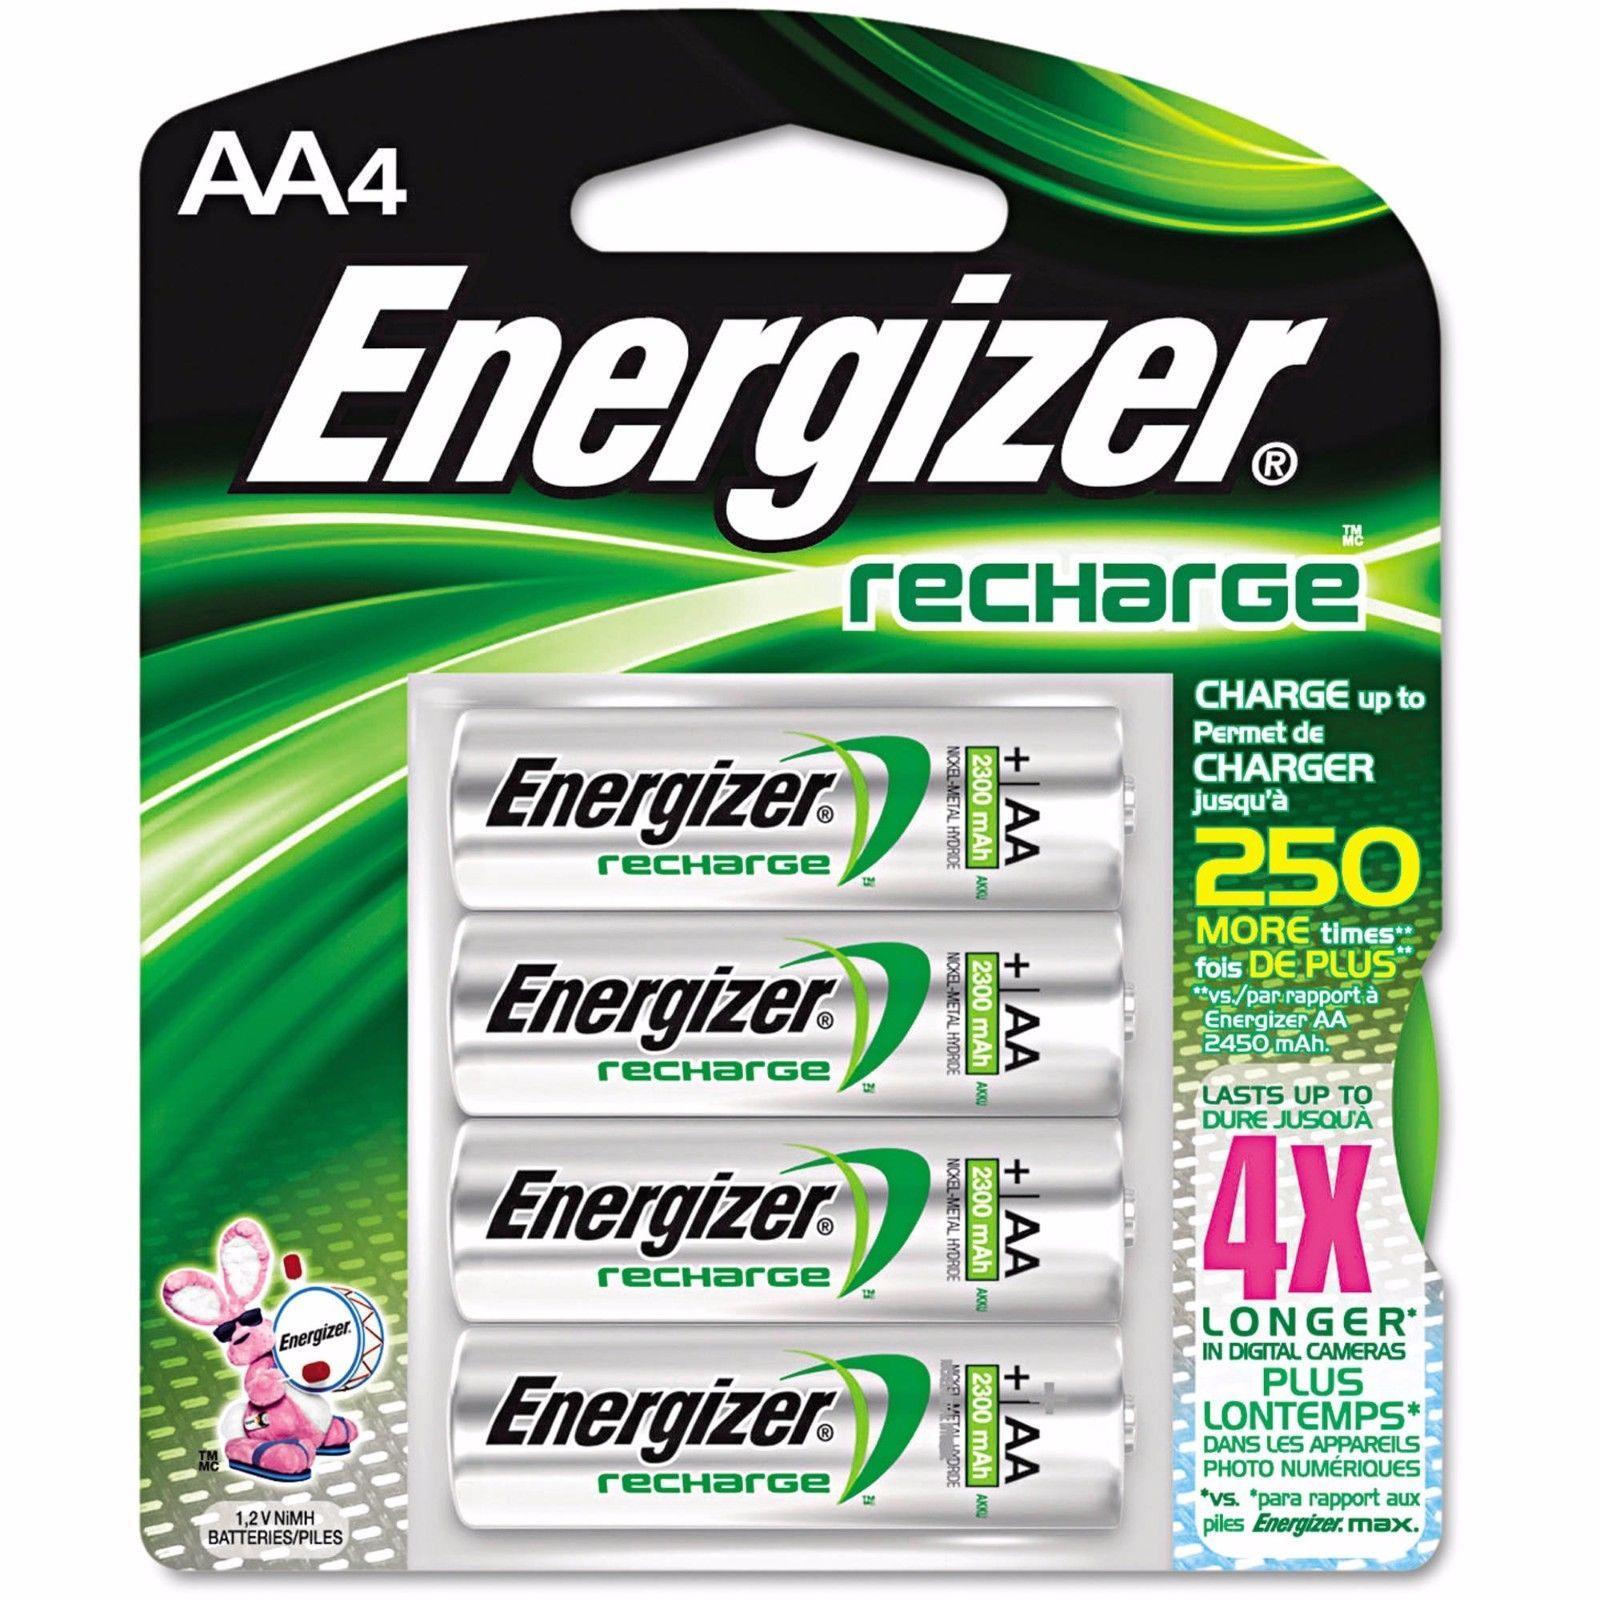 Aa4 Aa Energizer 2300 Mah Rechargeable Nimh Batteries Exp 2021 4 Pack Energizer Battery Rechargeable Batteries Energizer